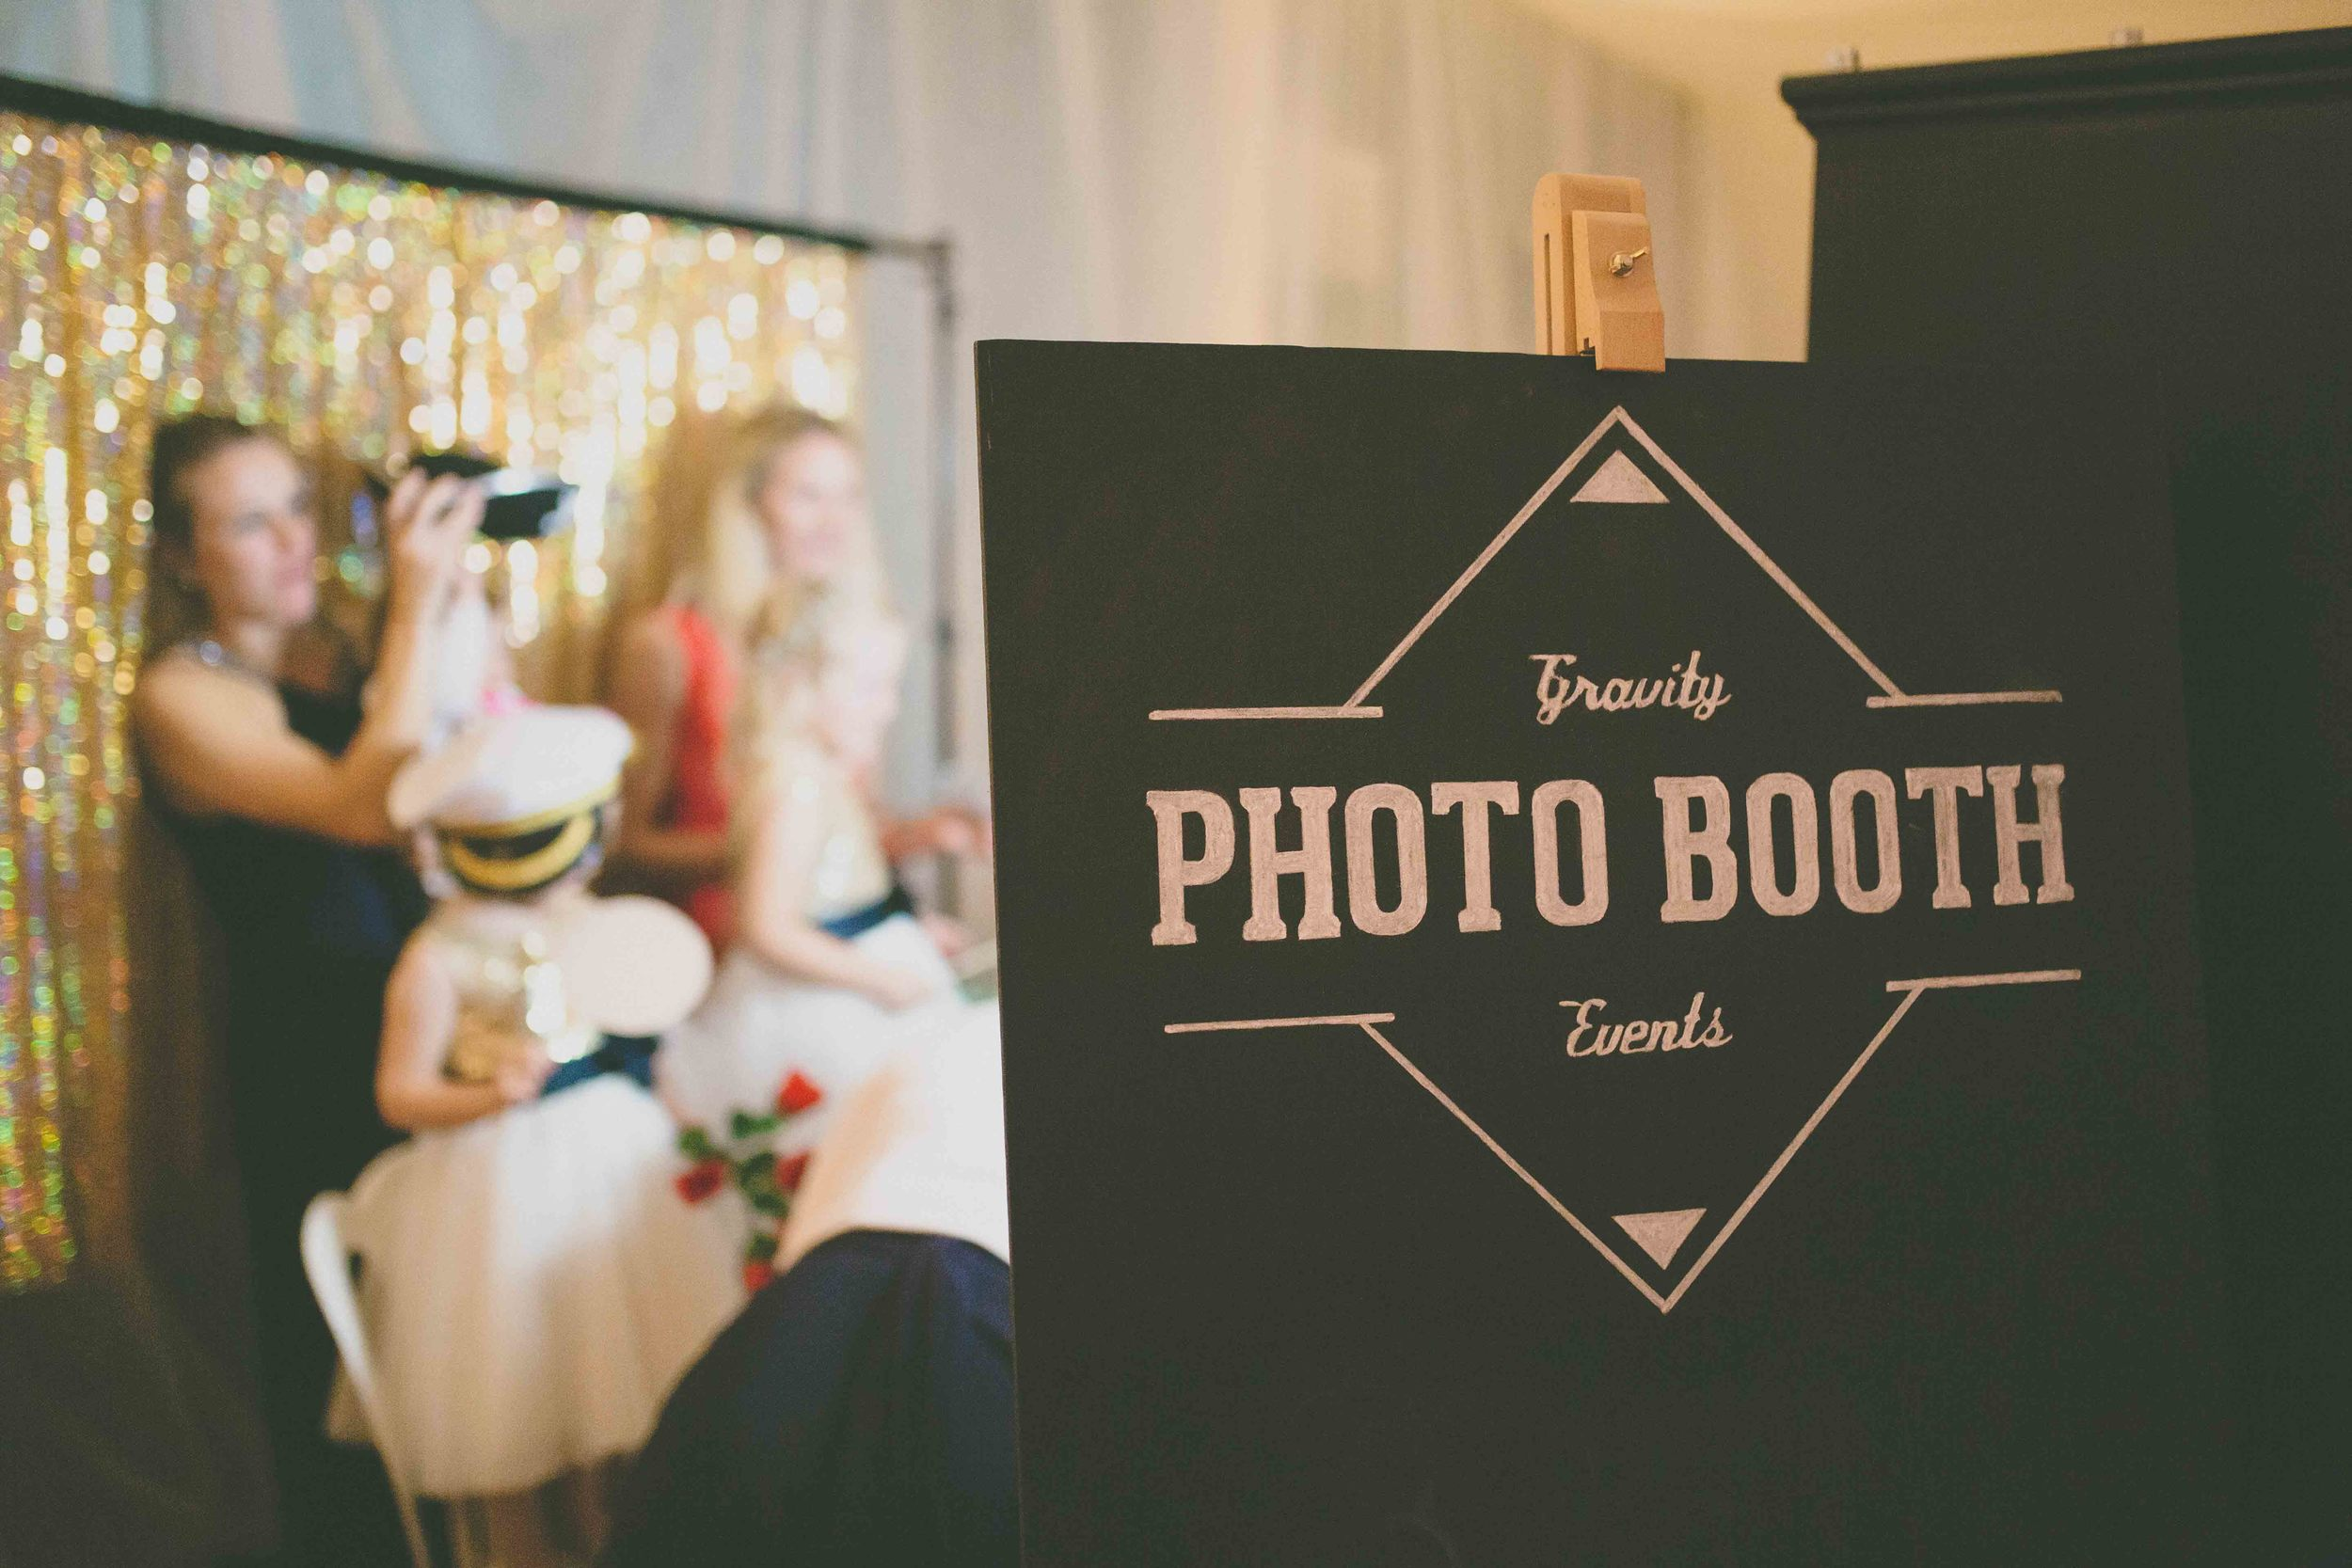 Photobooth 2.JPG